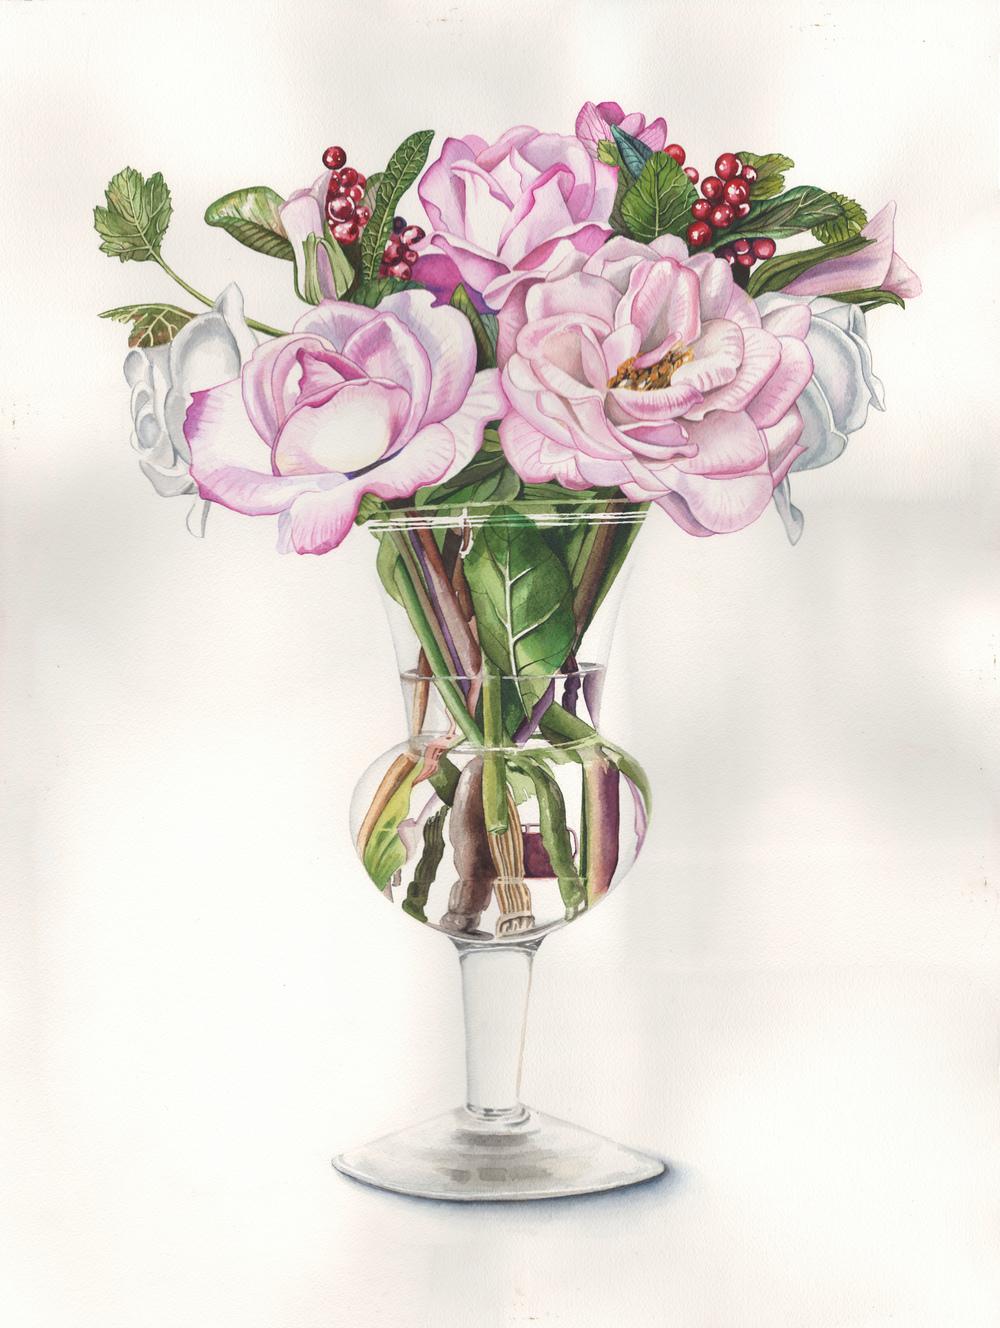 Vase Painting smaller.jpg